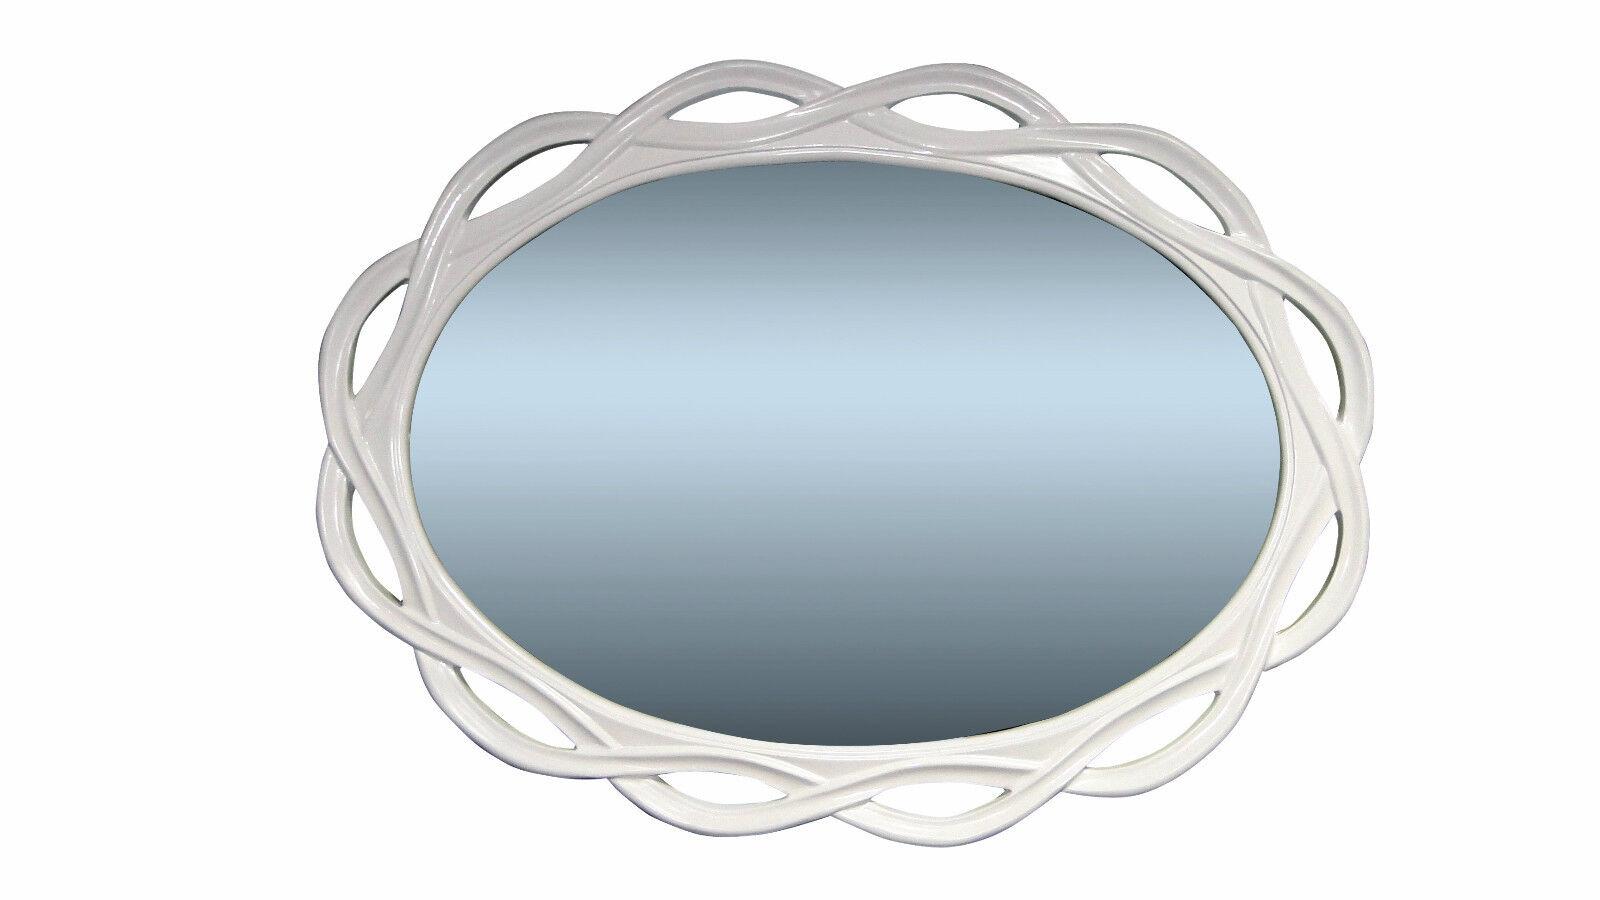 Spiegel Oval. spiegel oval paulownia holz wei ca b 65 x h 85 cm ...